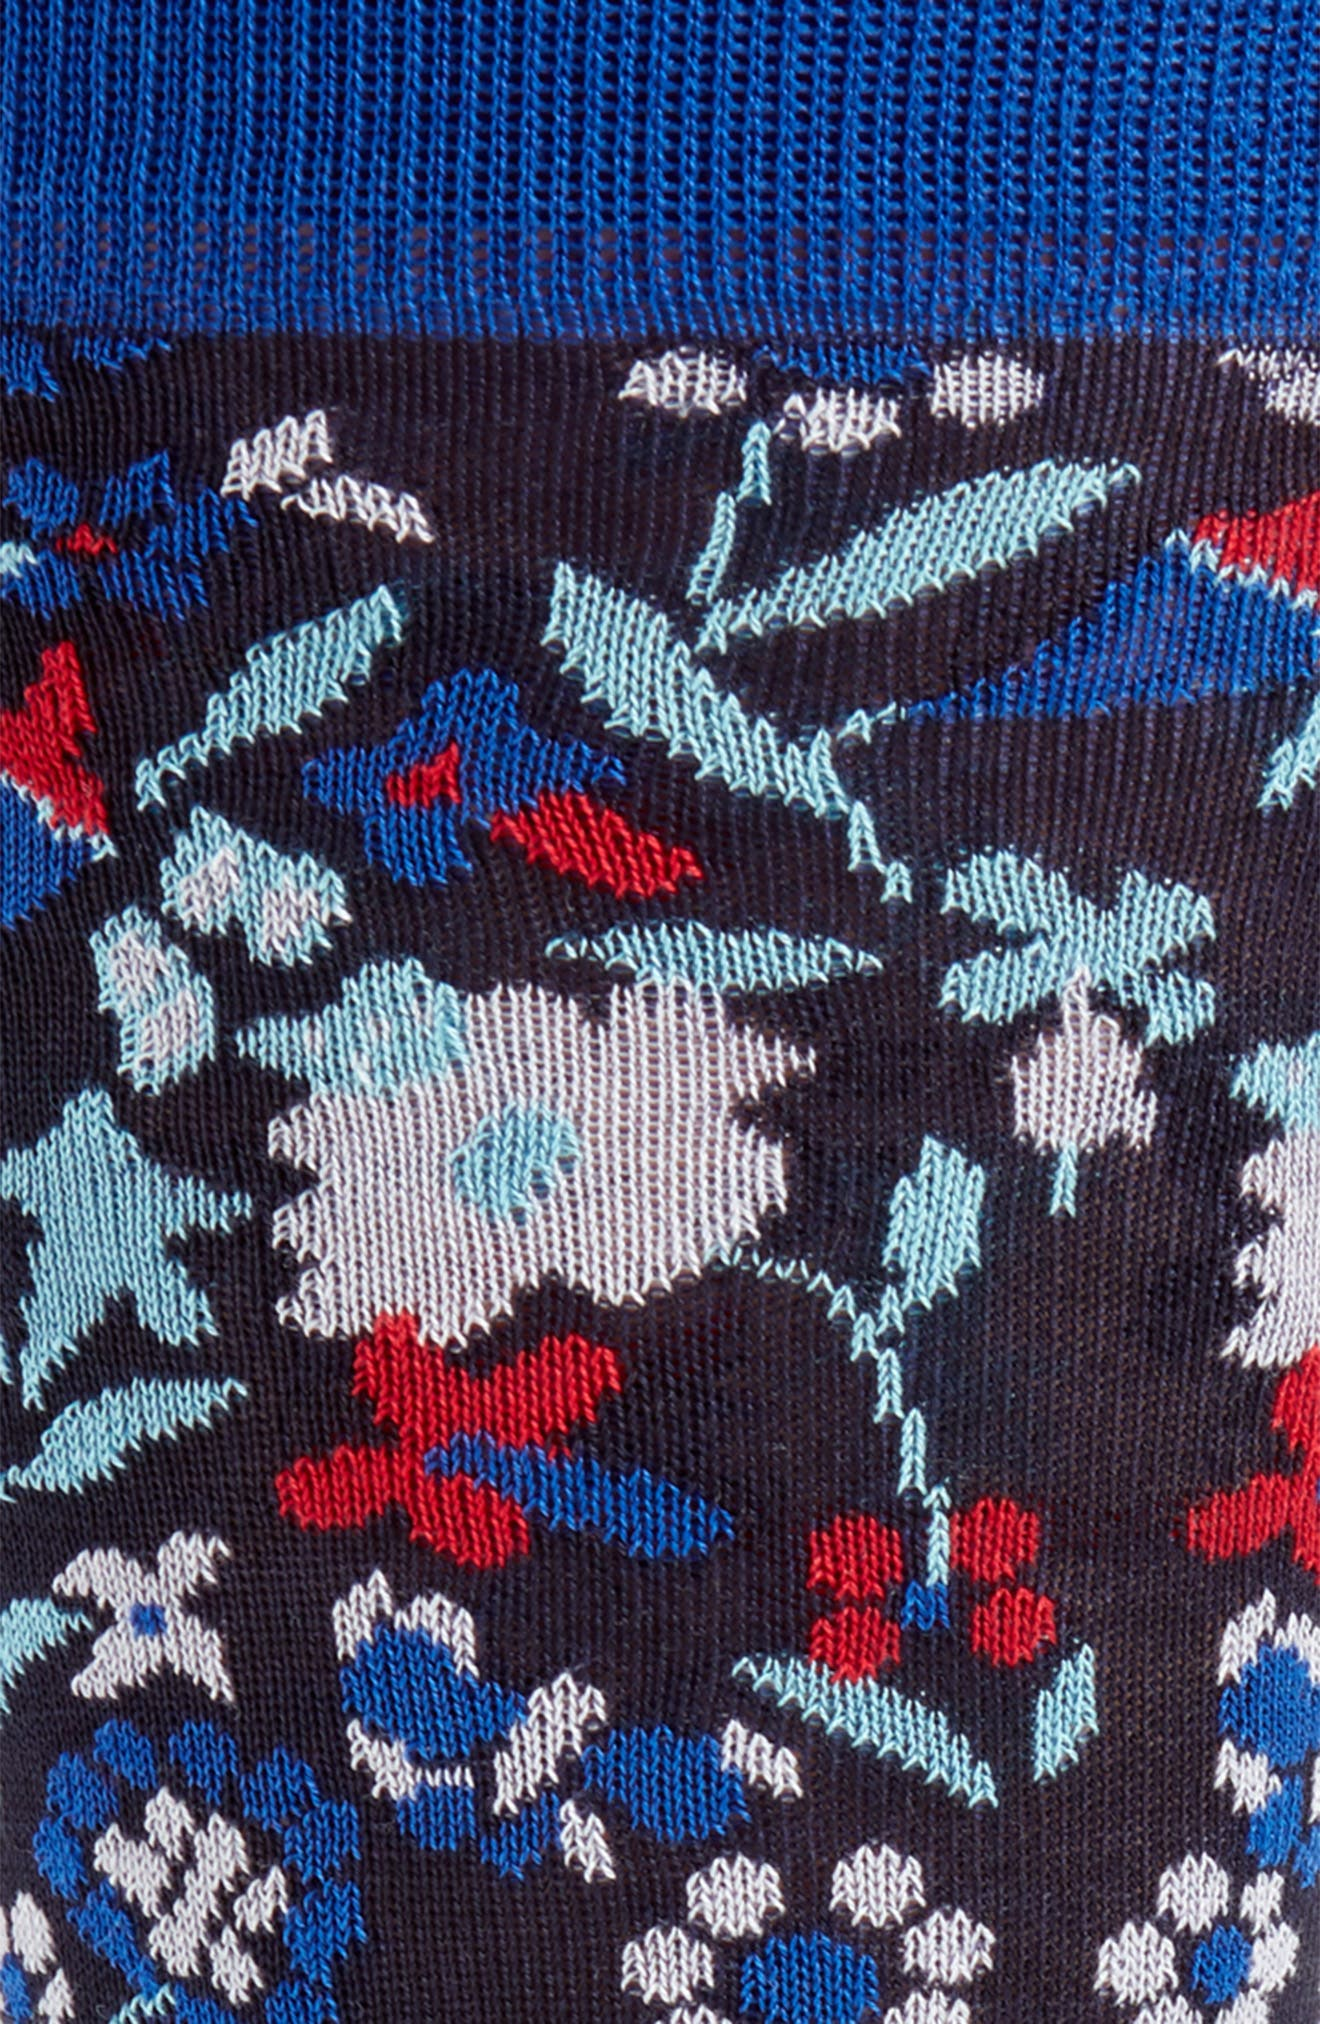 Tapestry Floral Socks,                             Alternate thumbnail 2, color,                             Navy/ Red